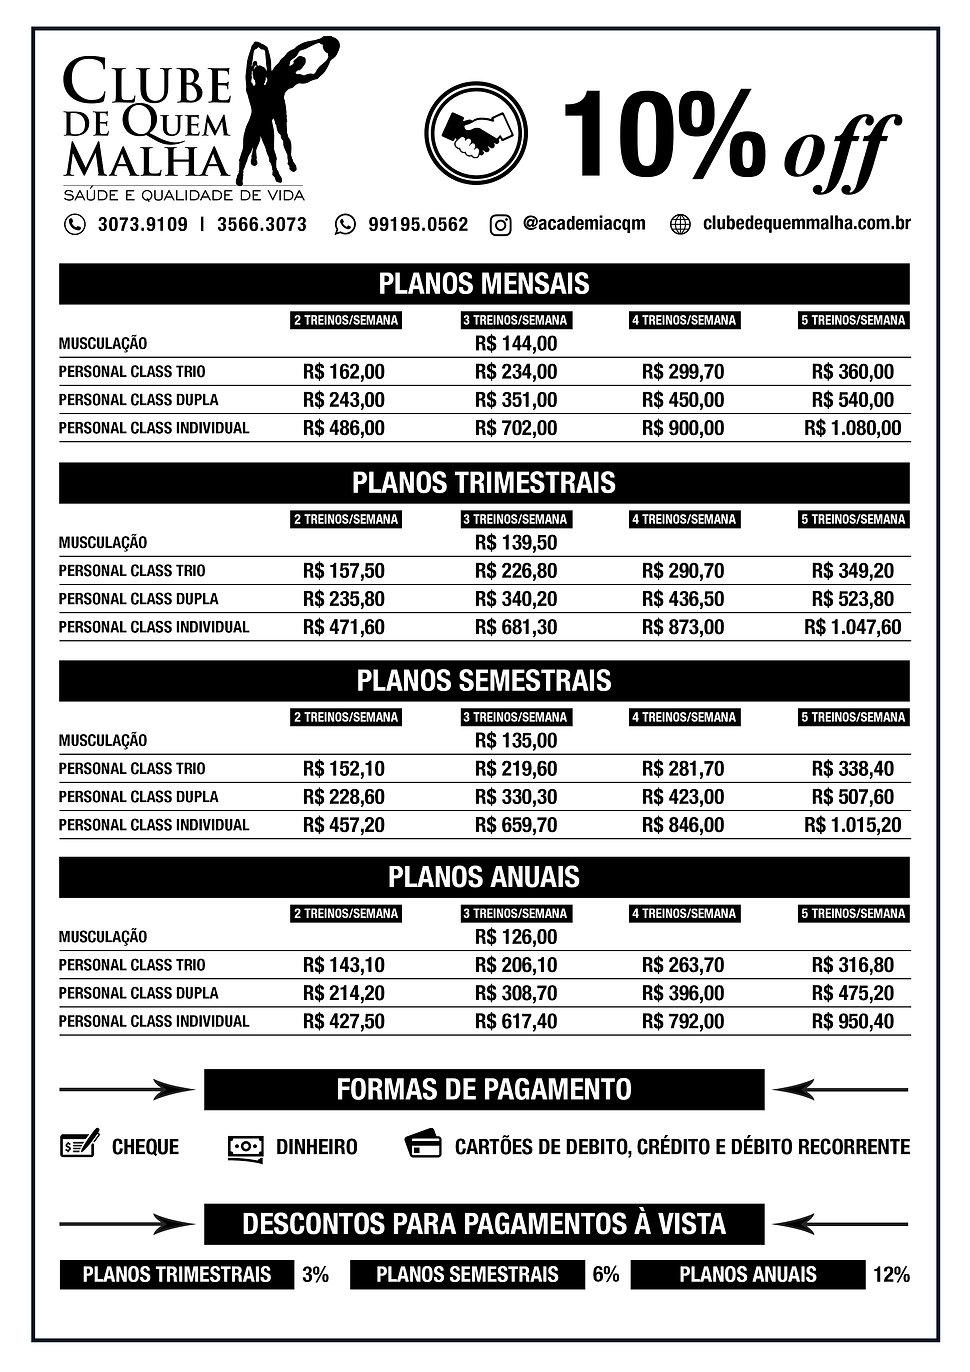 Cardápio_de_Preços_-_A4_-_Pós_COVID2_